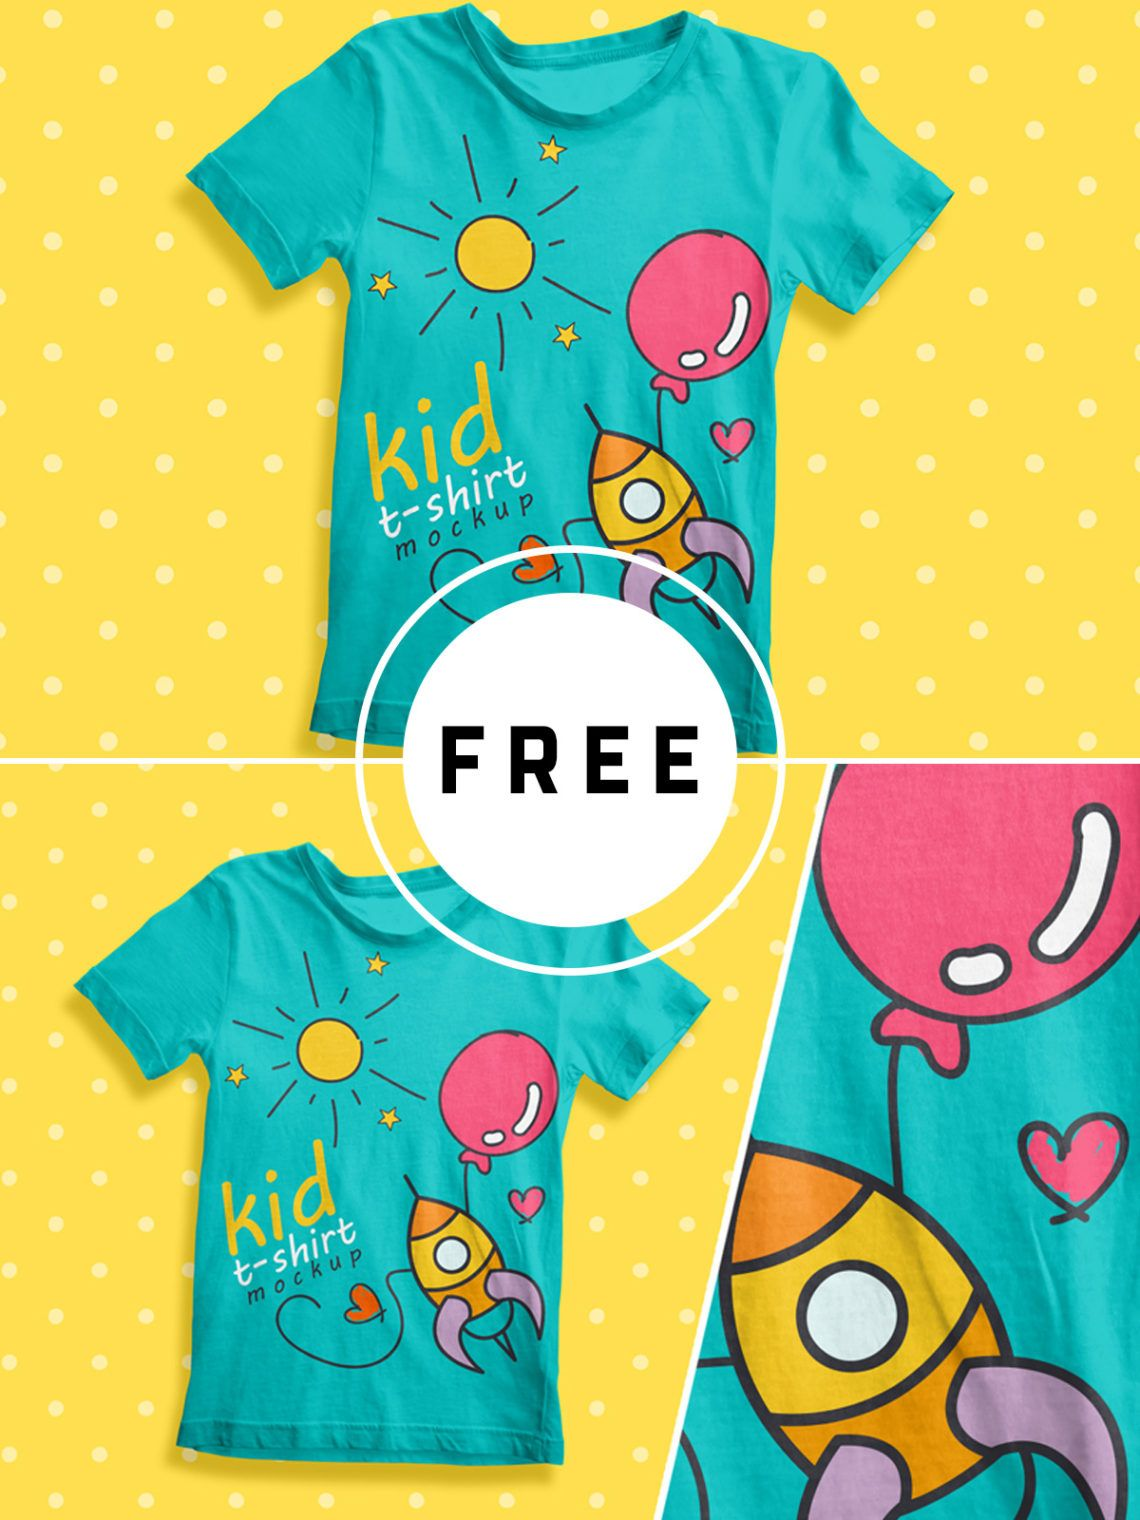 Download 25 Multipurpose Free T Shirt Mockups For Your Breathtaking Designs Kids Tshirts Shirt Mockup Tshirt Mockup